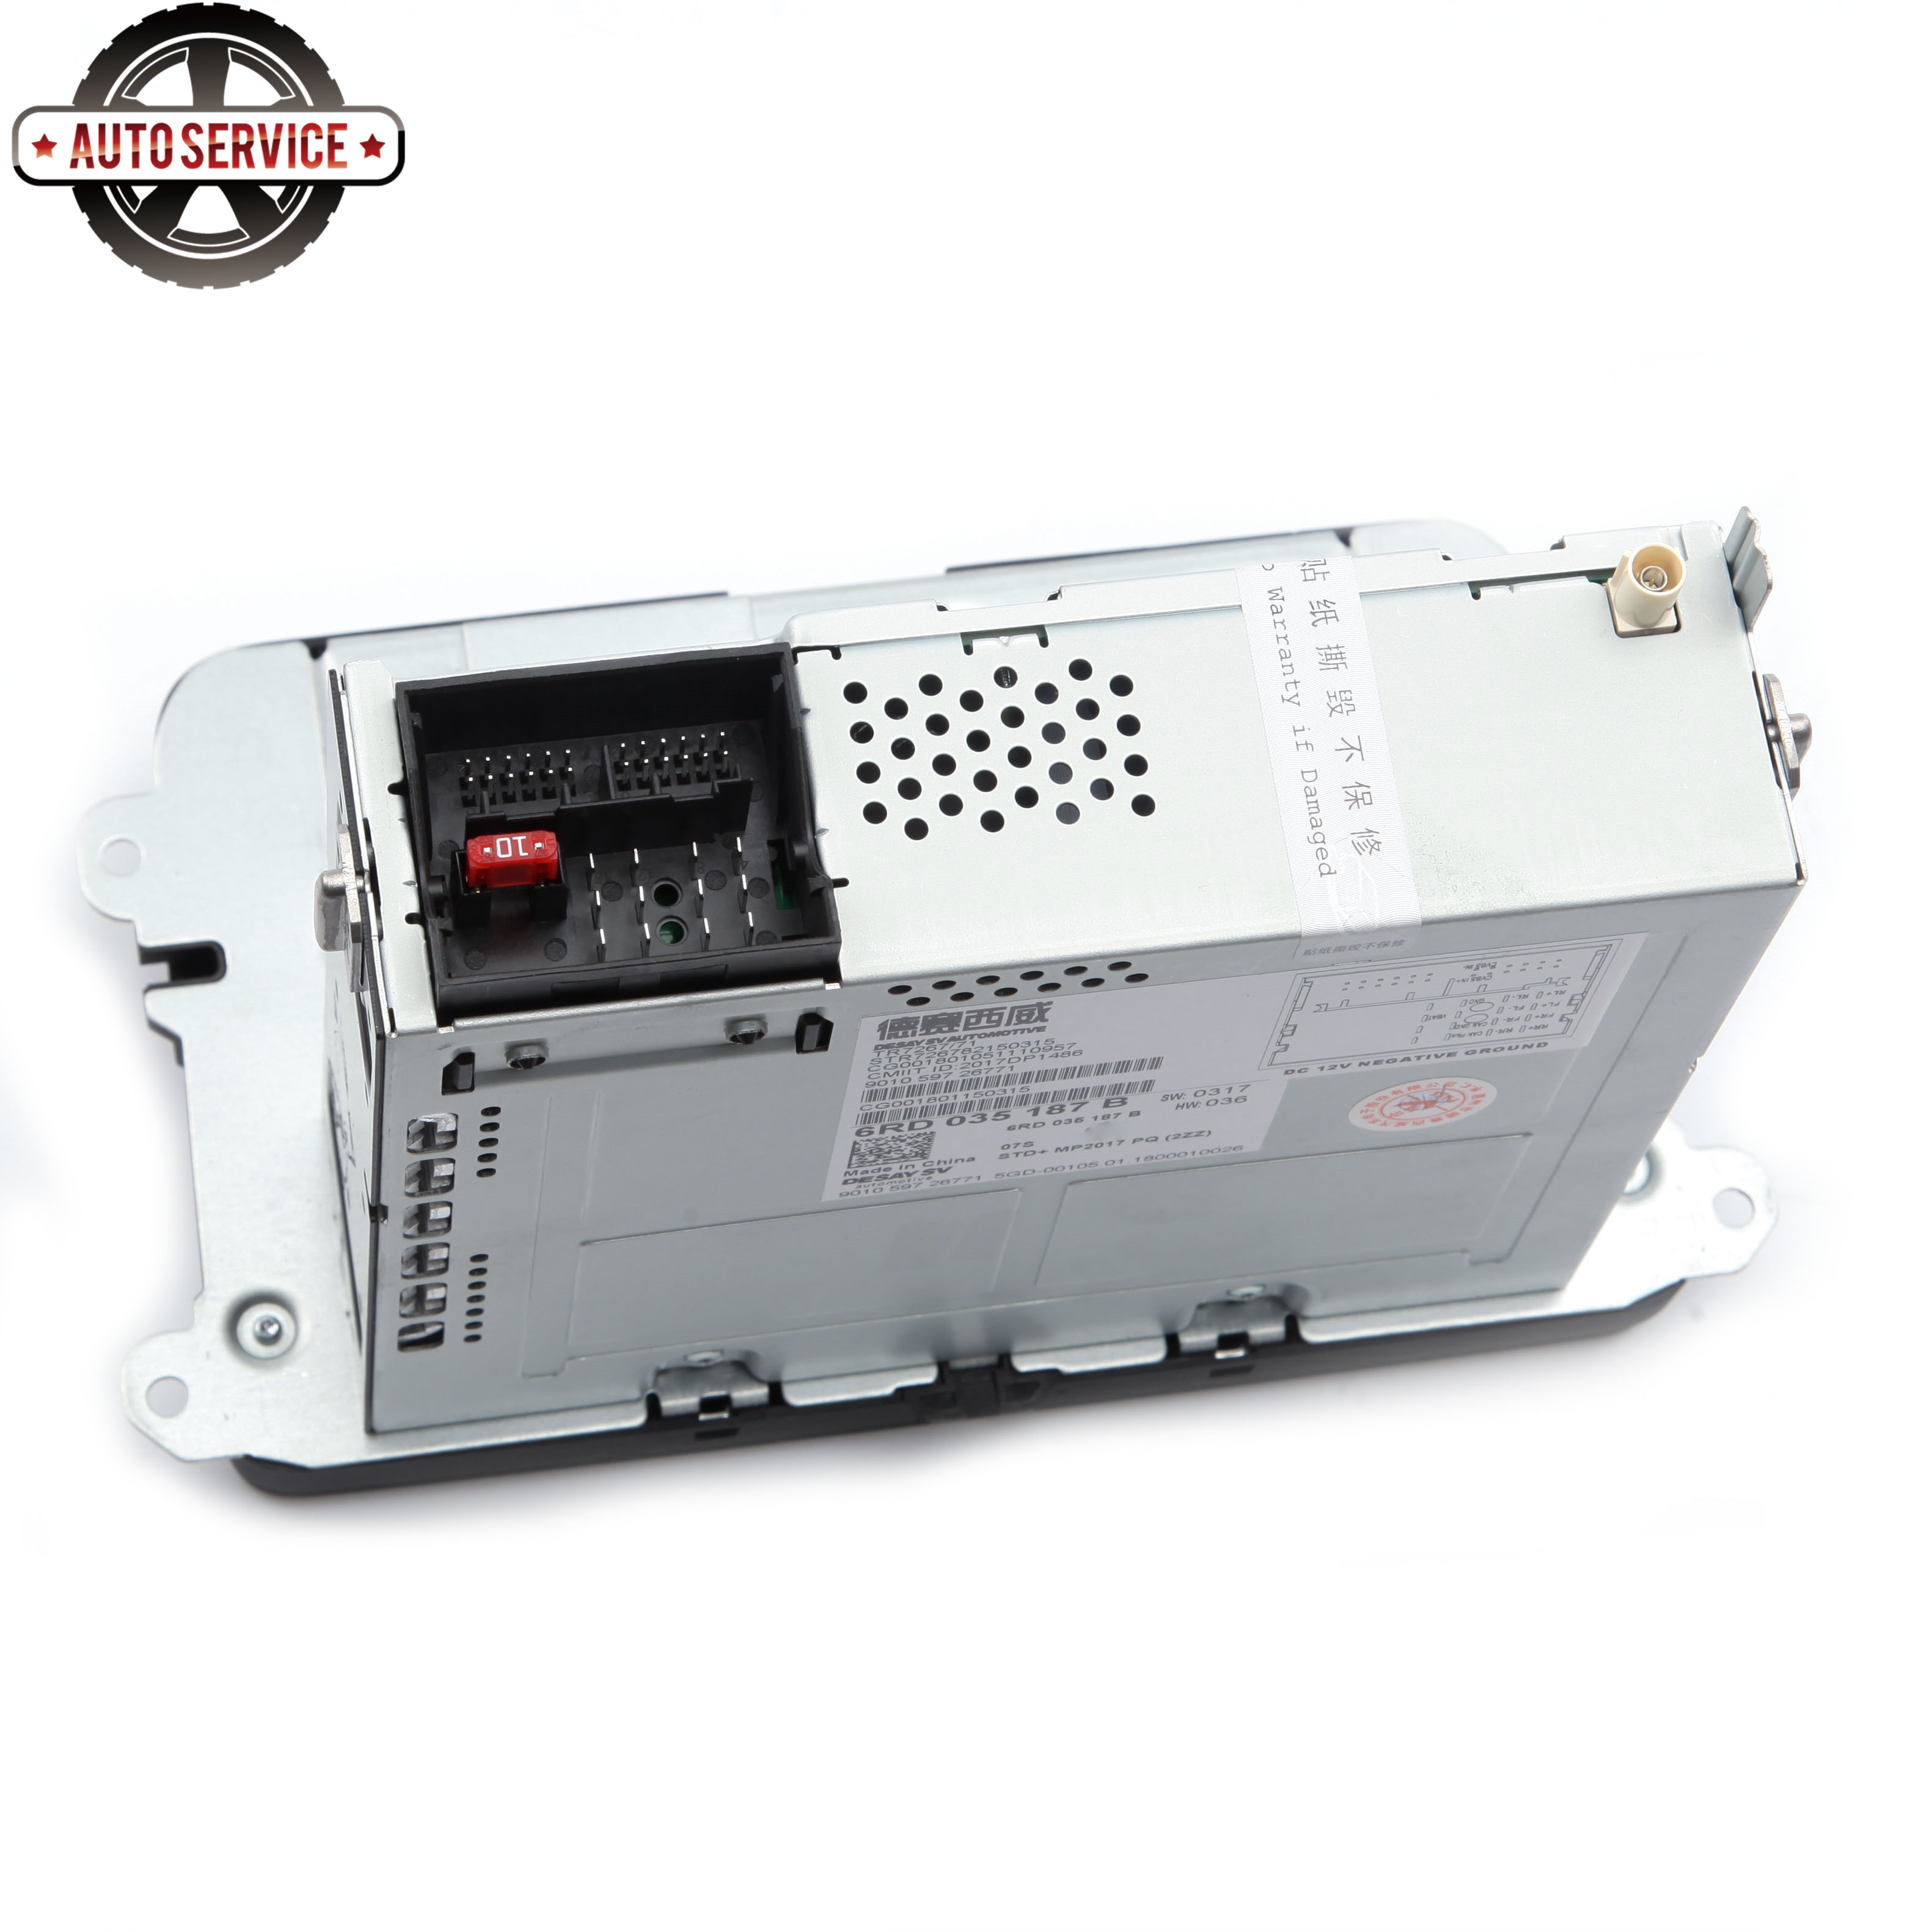 Nuevo RCD330 más RCD330G Carplay MIB 6,5 pulgadas Radio para Jetta MK5 MK6 CC Passat 6RD035187B 1GB de RAM cámara de Vista trasera Bluetooth USB - 6